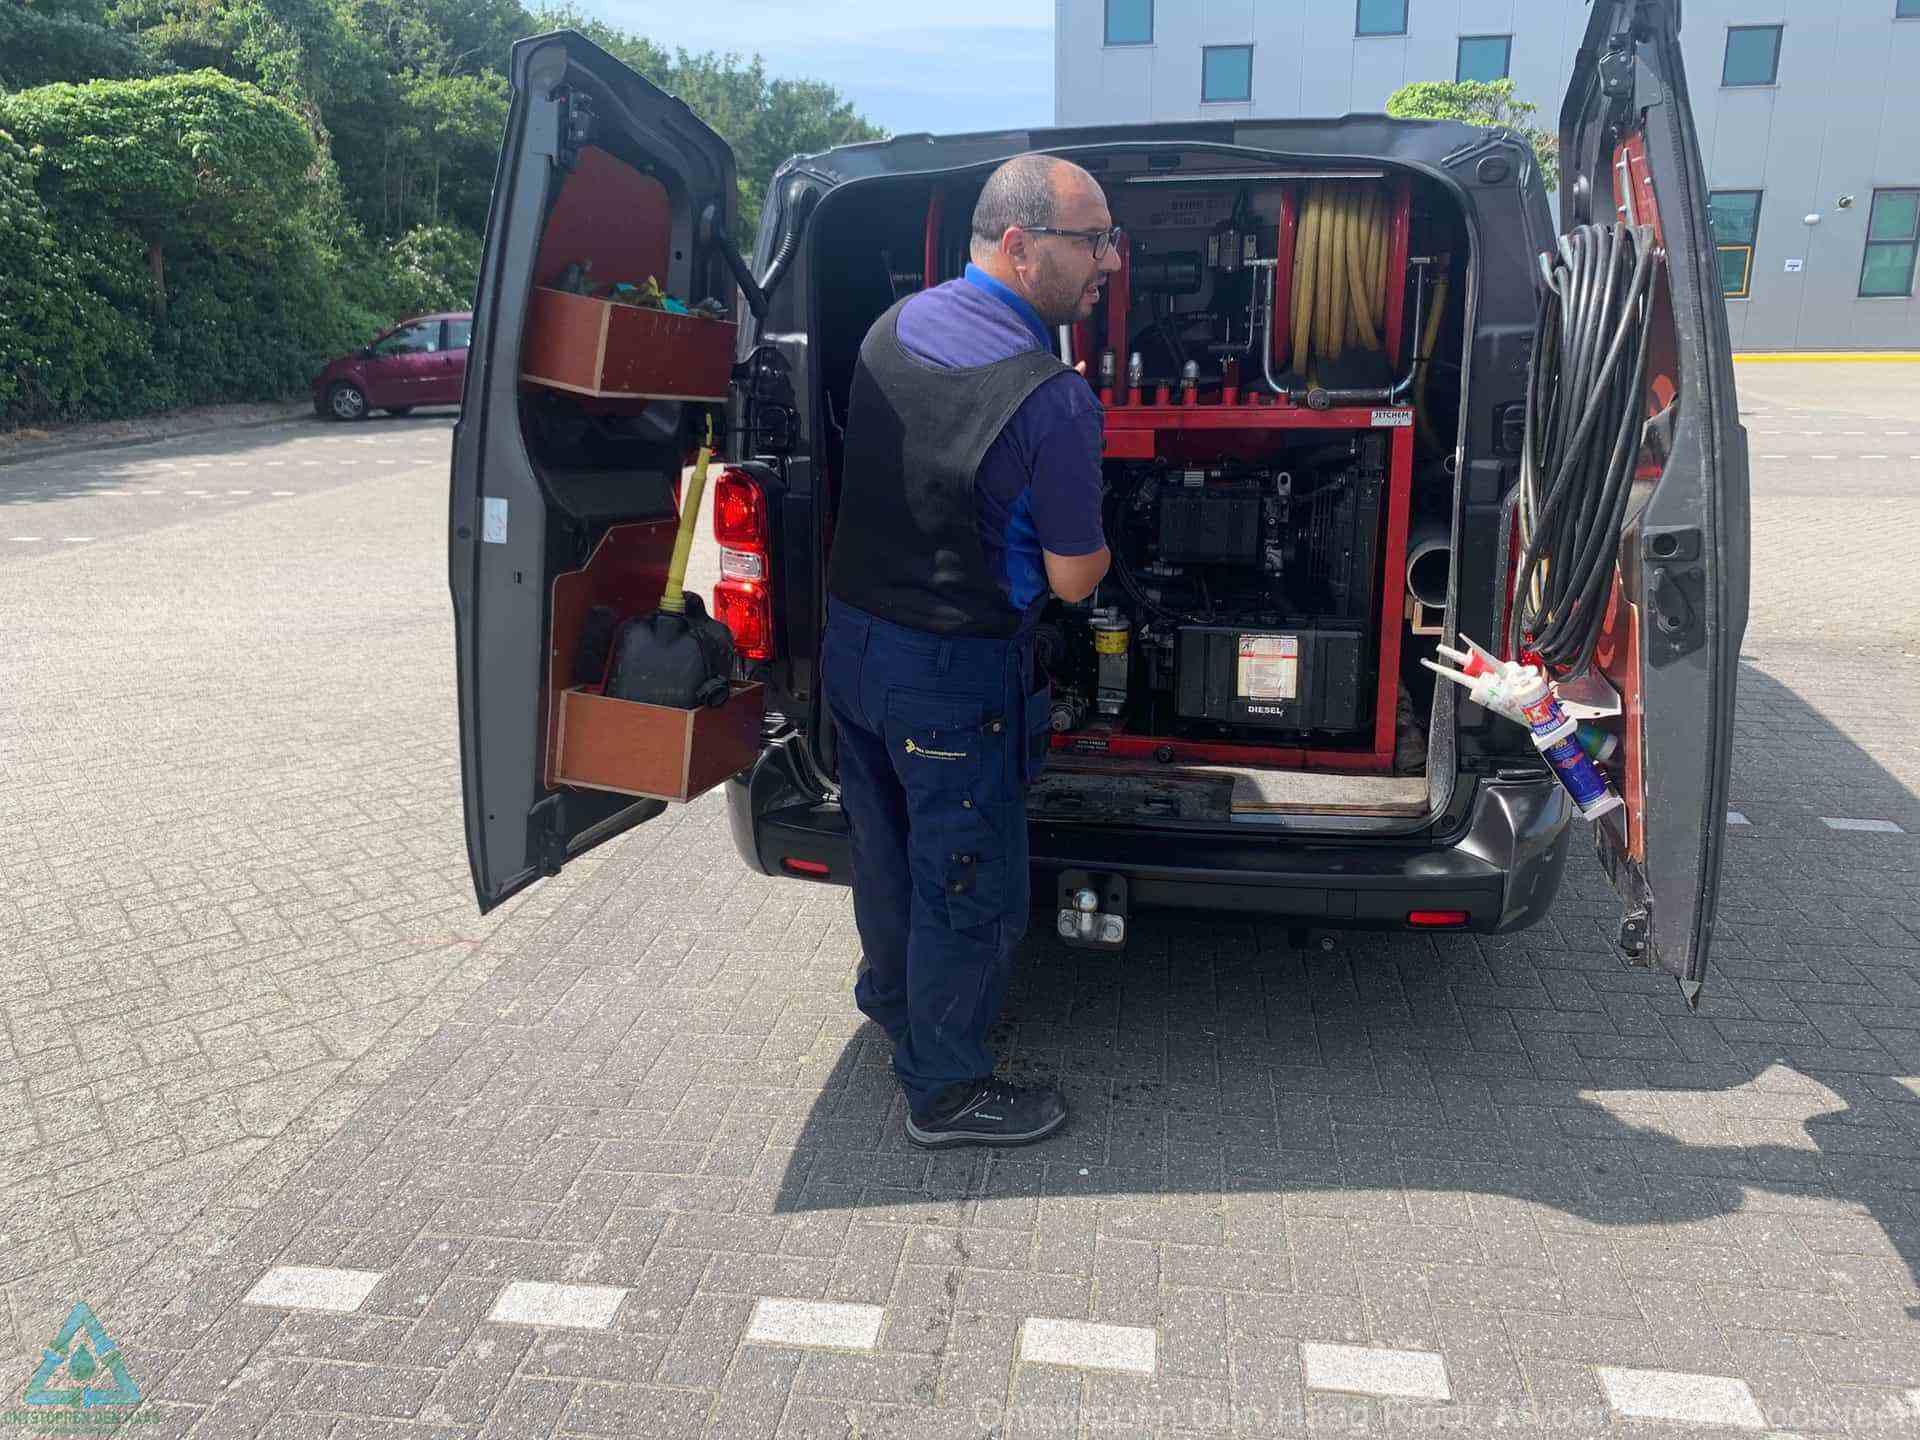 Loodgieter Den Haag Ontstopping